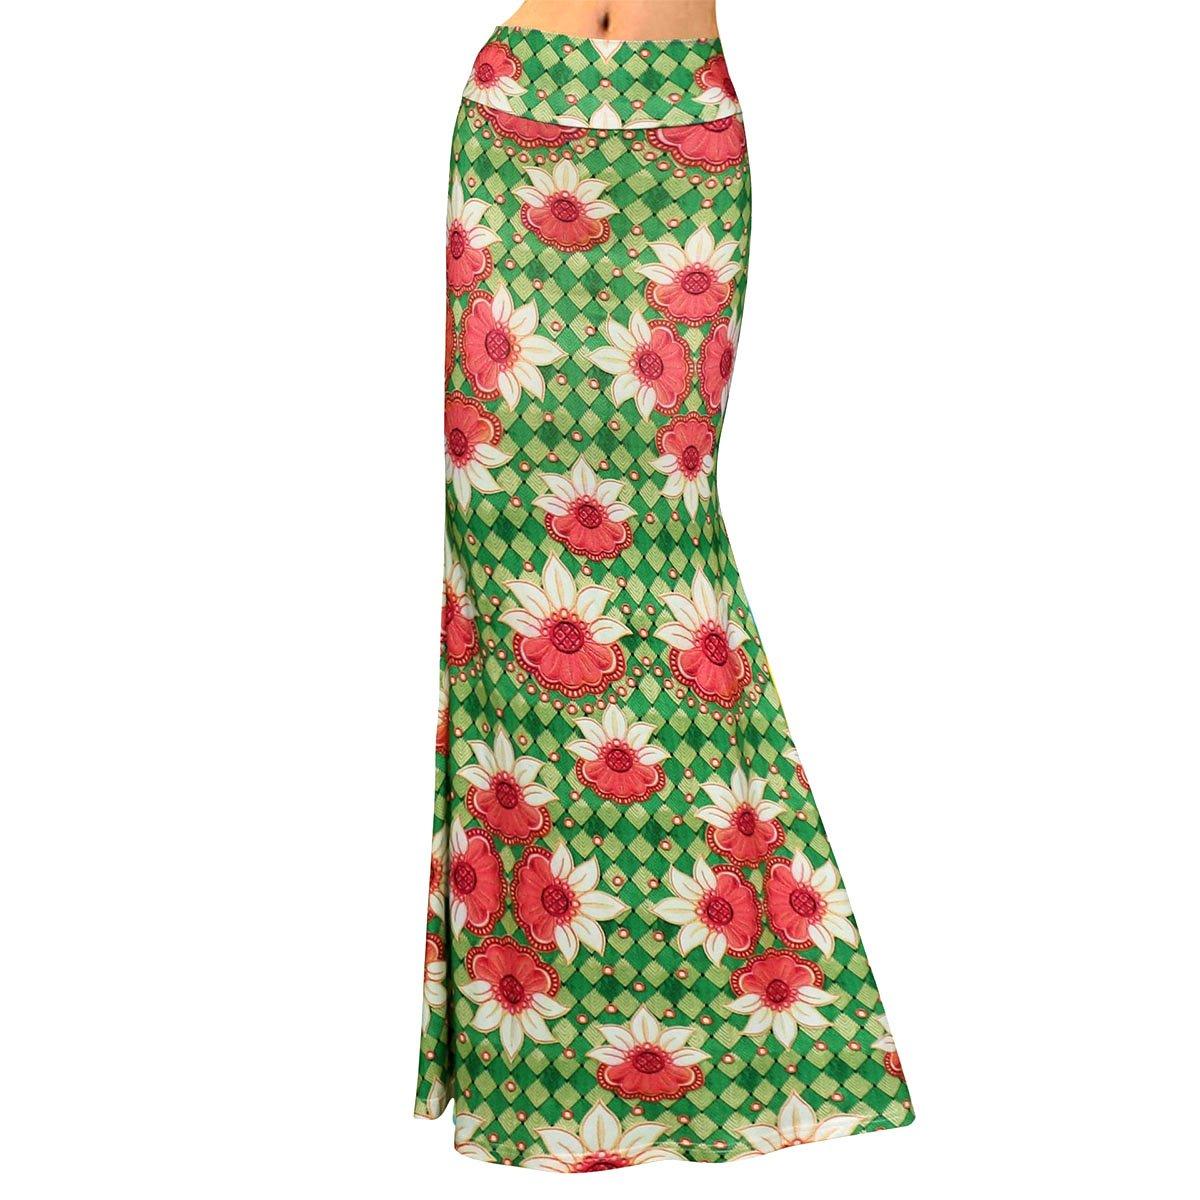 Women Floral Print Maxi Skirt High Waist Hip Package Long Skirt Summer Foldover Full Skirts for Daily Evening Party Beach Travel Green Flower L